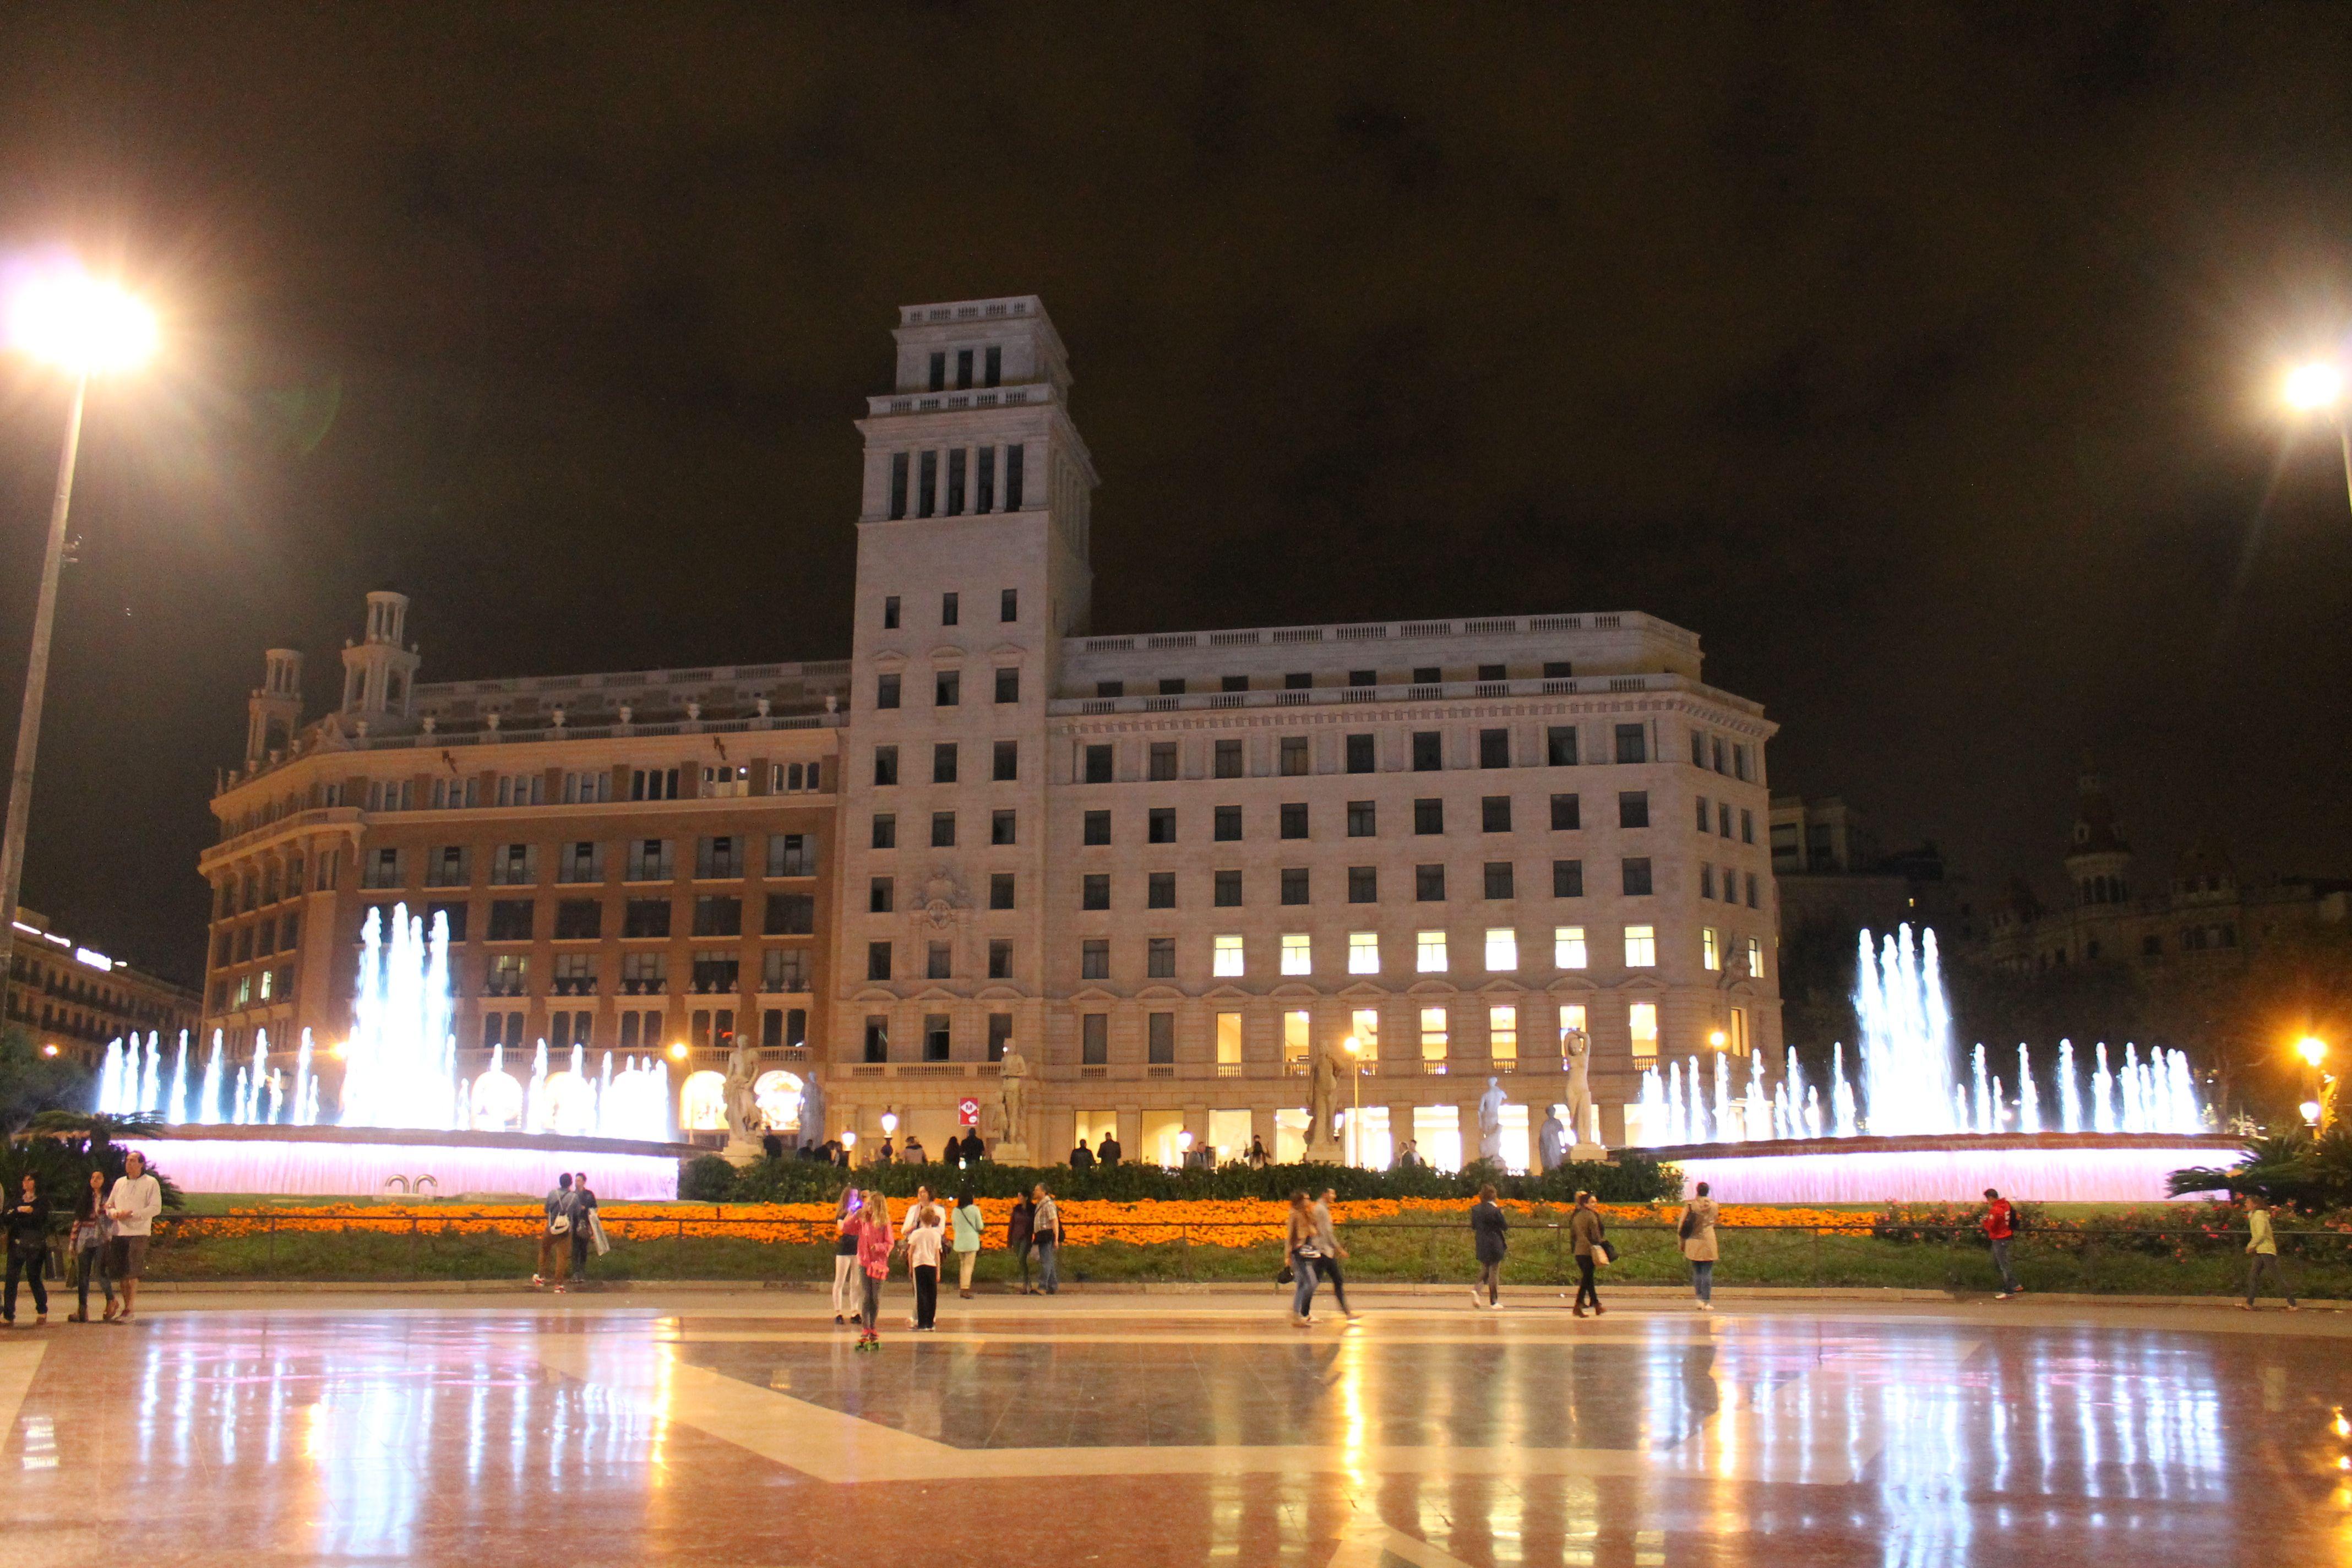 #PlaçadeCatalunya #Barcelona #Spain